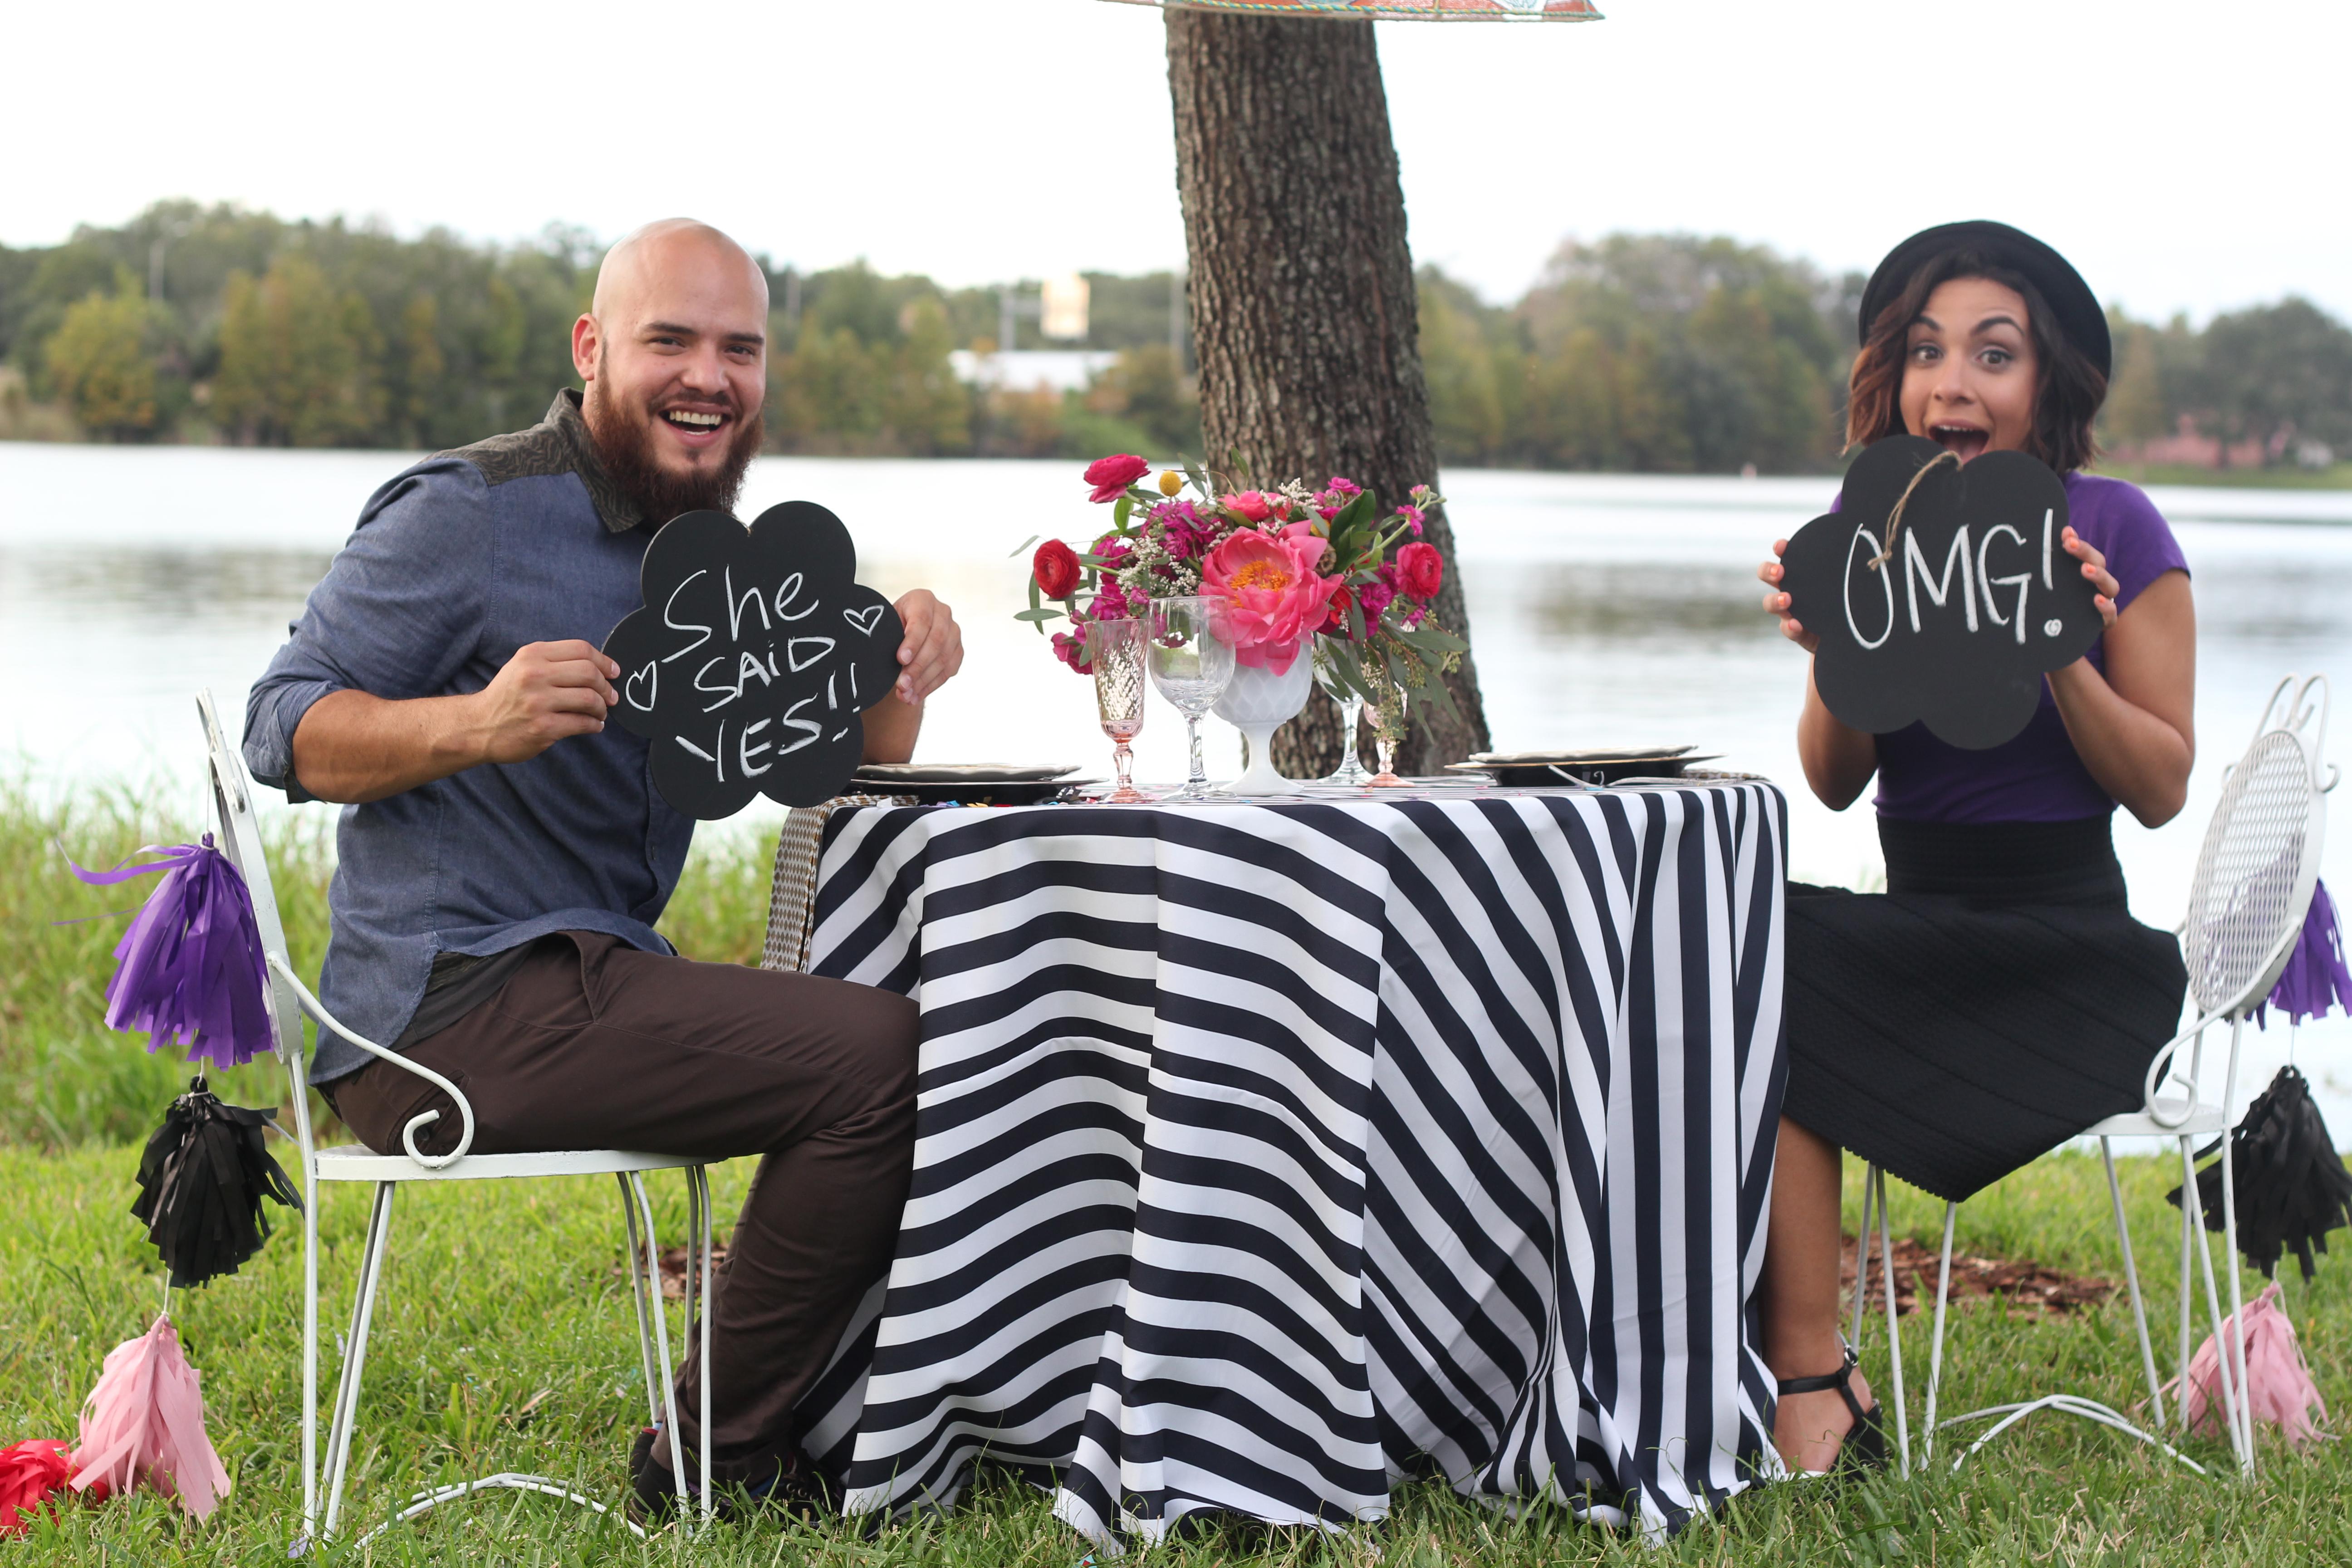 Image 2 of Laudys & John | Surprise Styled Proposal